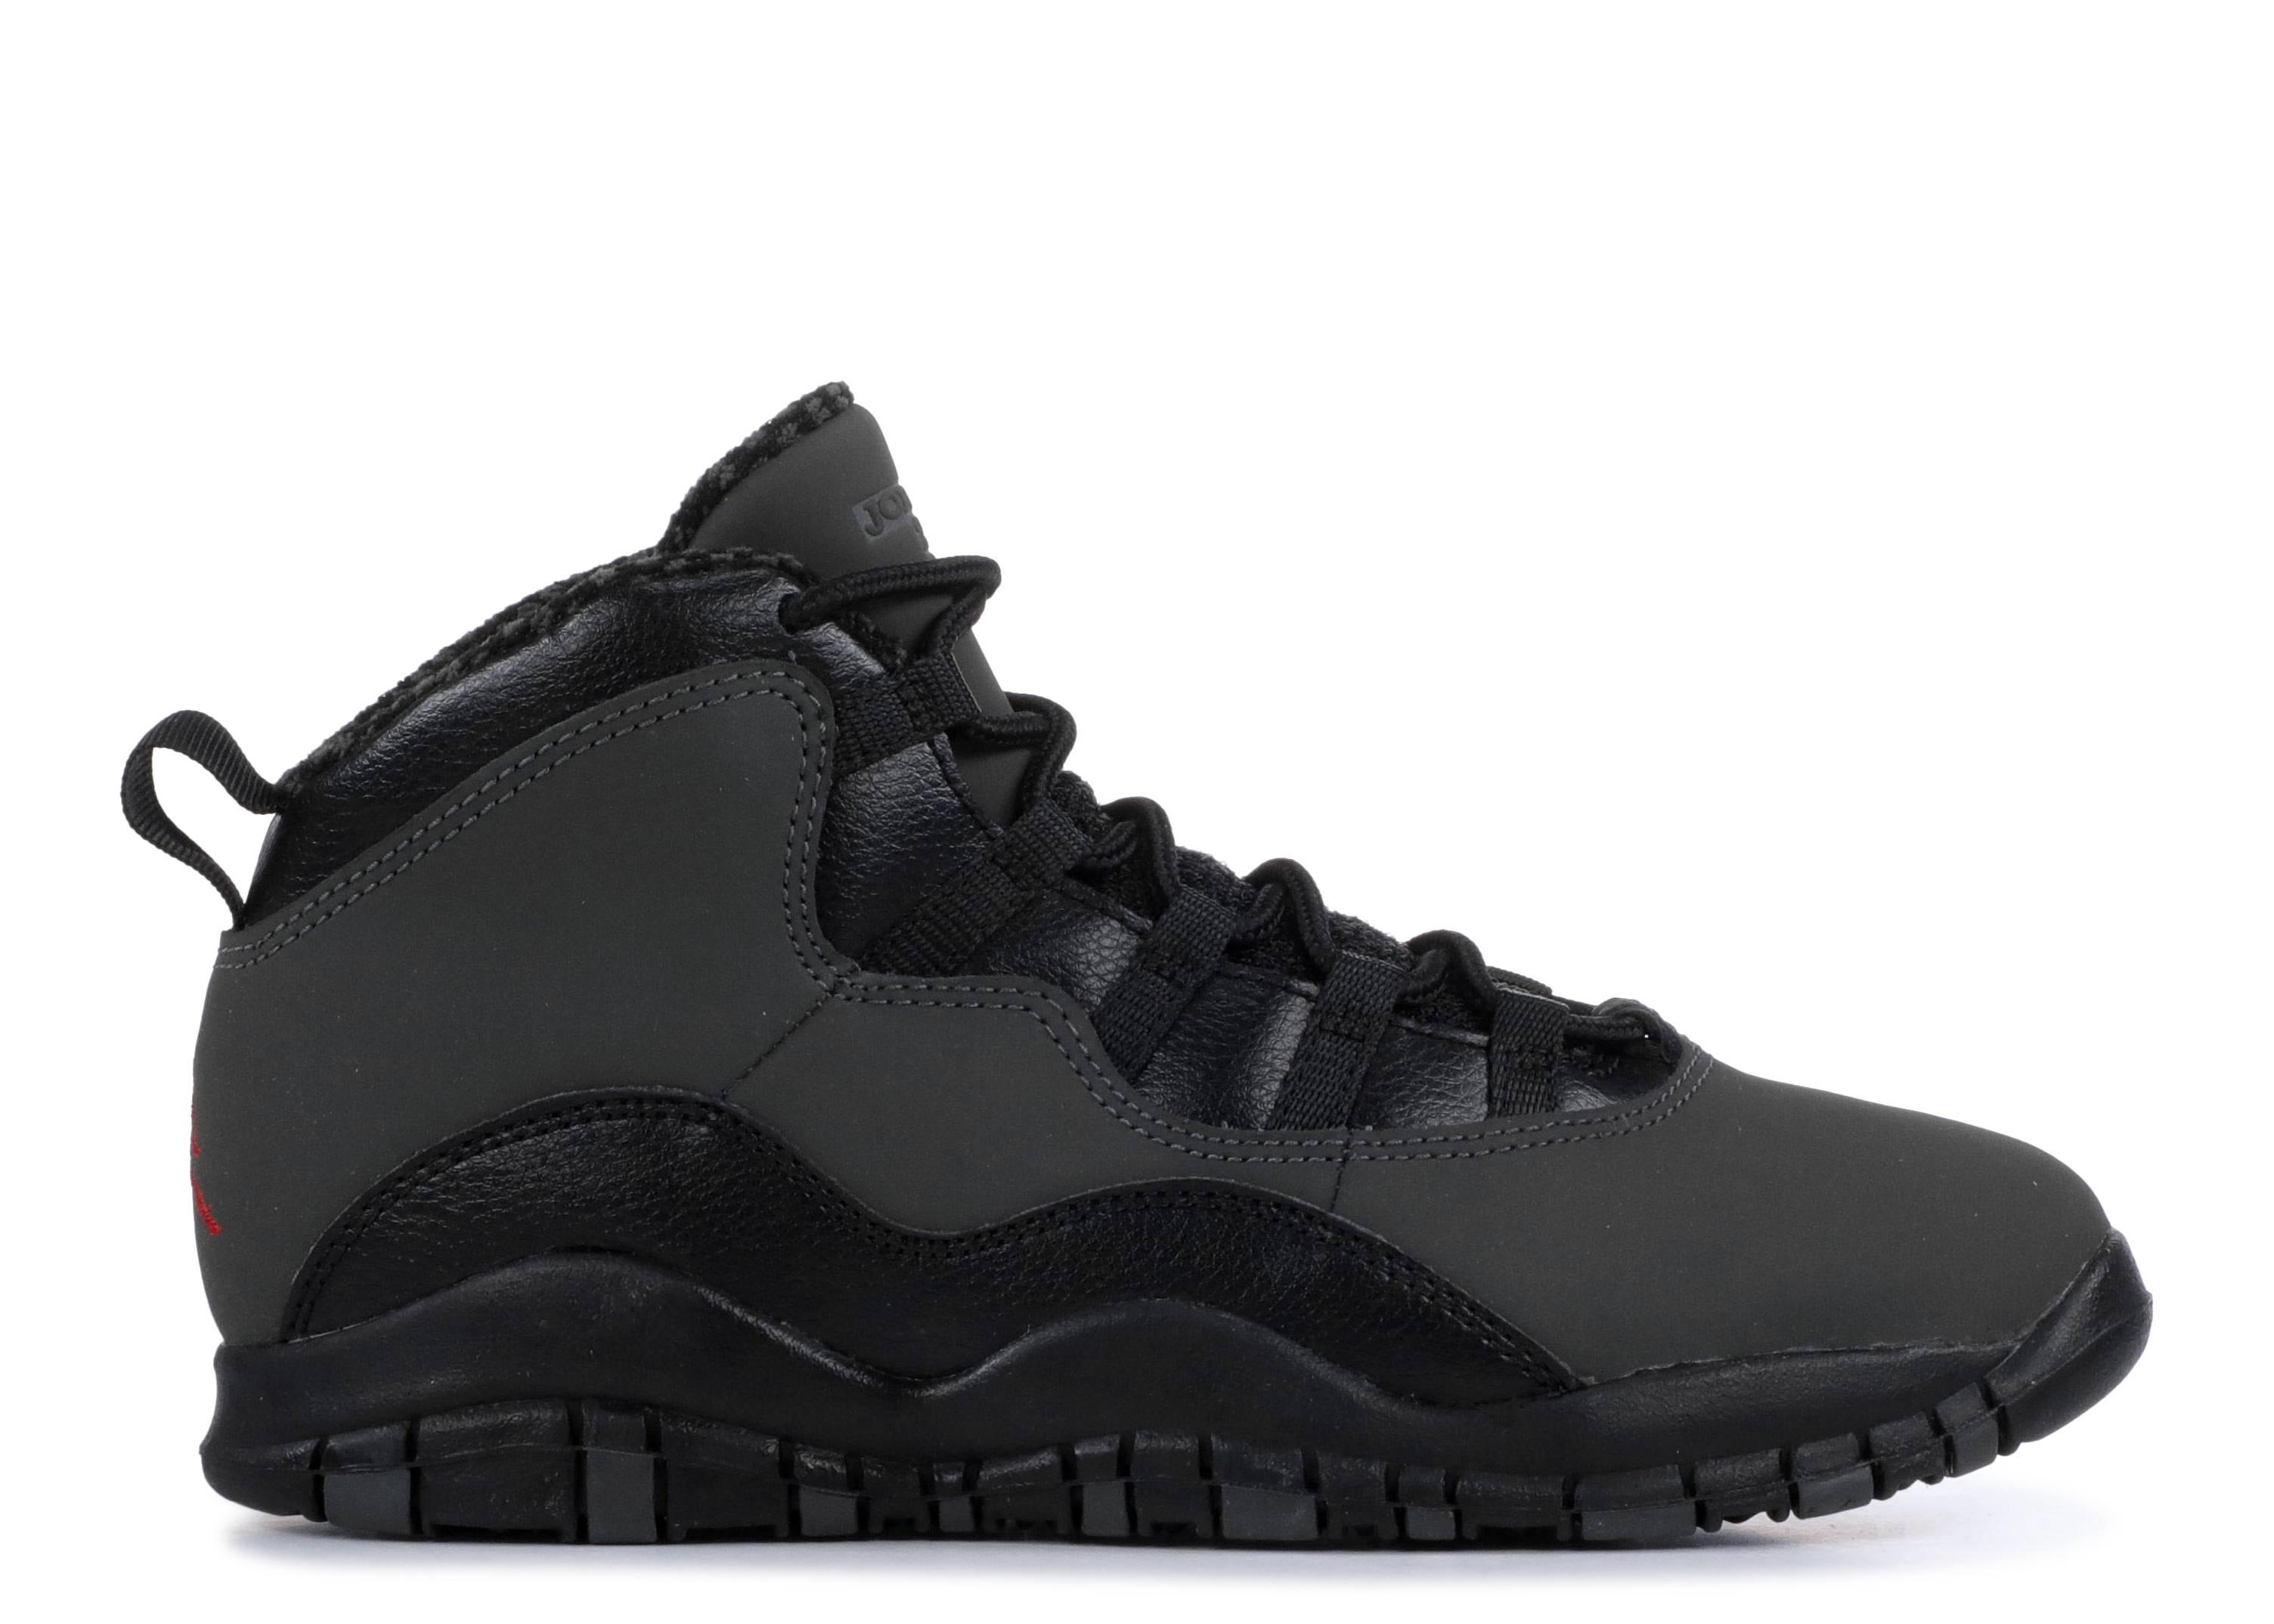 sports shoes 63523 f625c Jordan Retro 10 - Air Jordan - 310807 002 - dark shadow true red ...